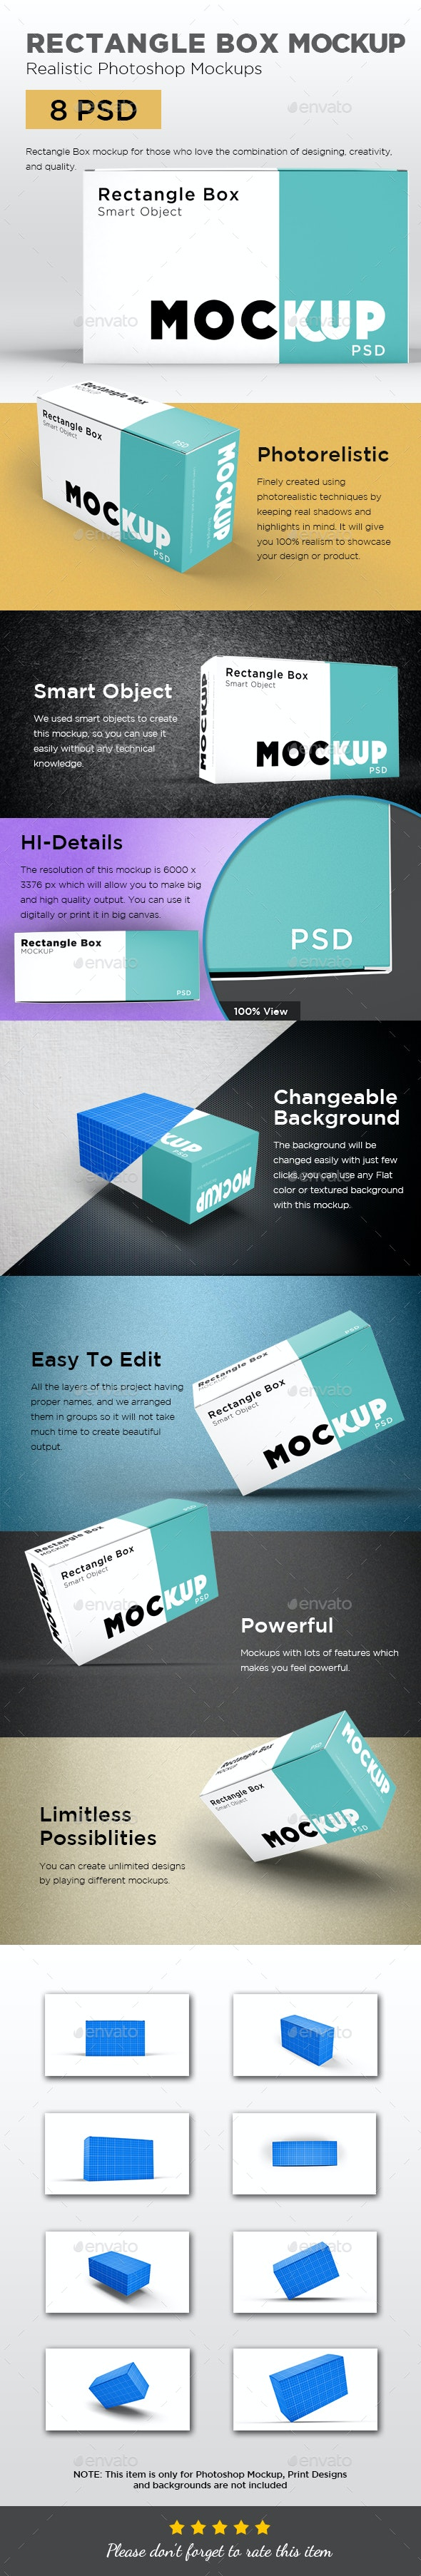 Rectangle Box Mockup - Packaging Product Mock-Ups